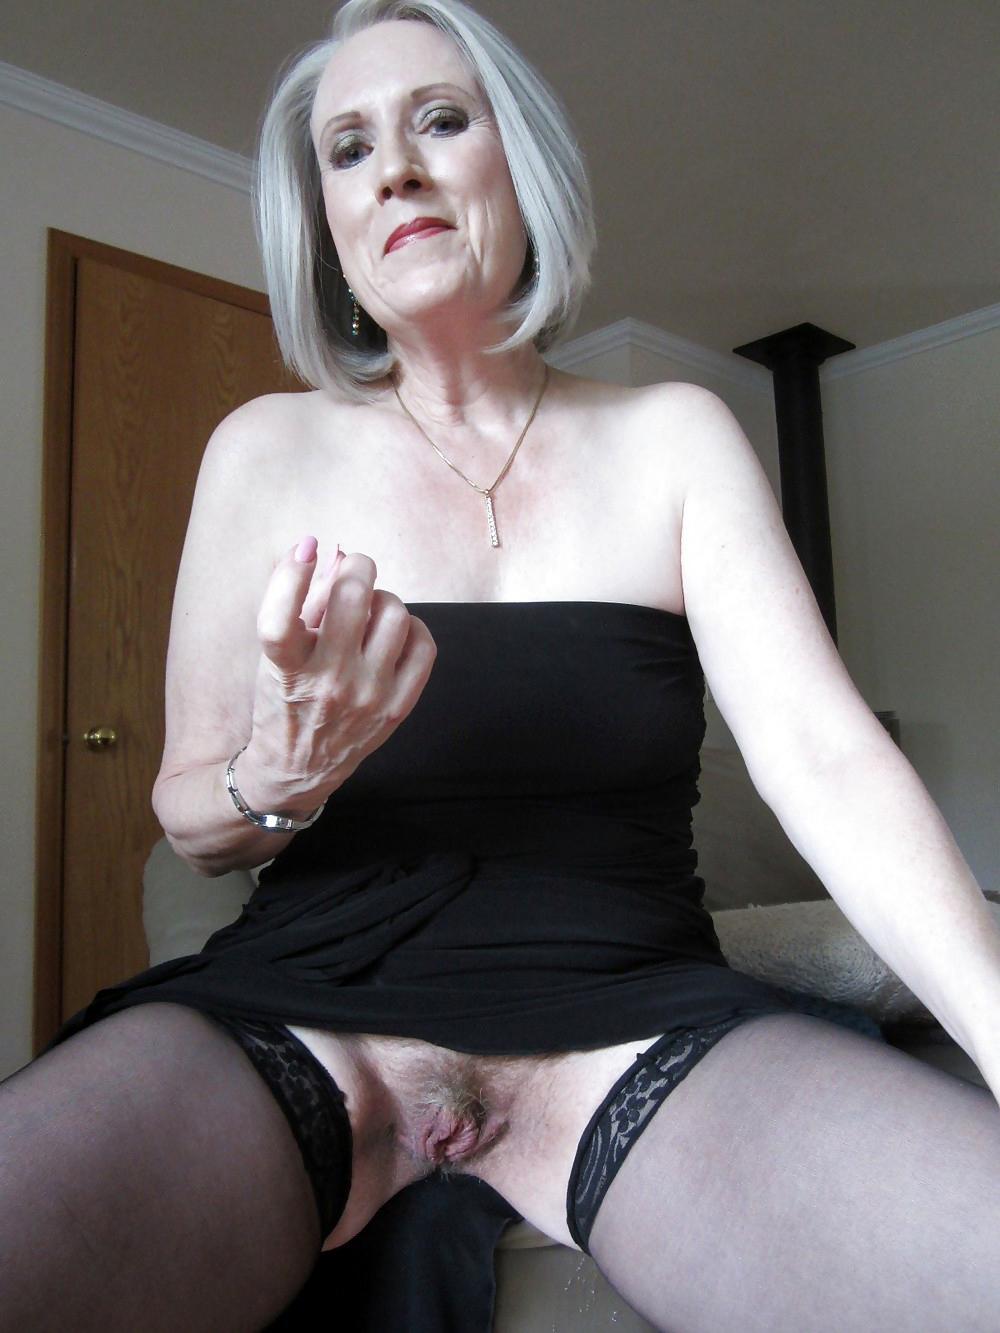 Blonde milf upskirt no panties